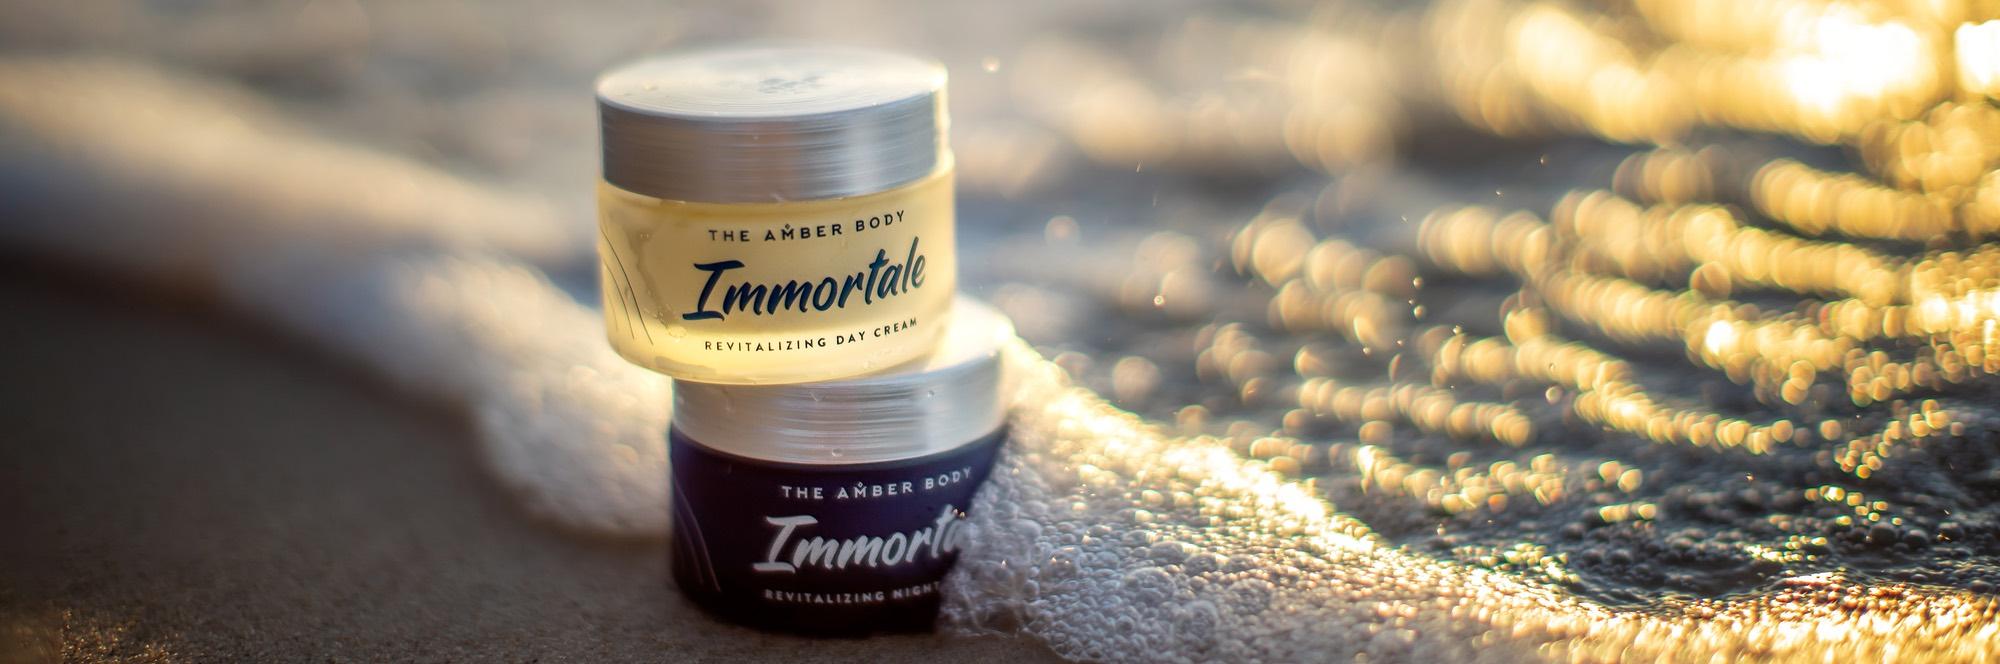 The Amber Body Immortale